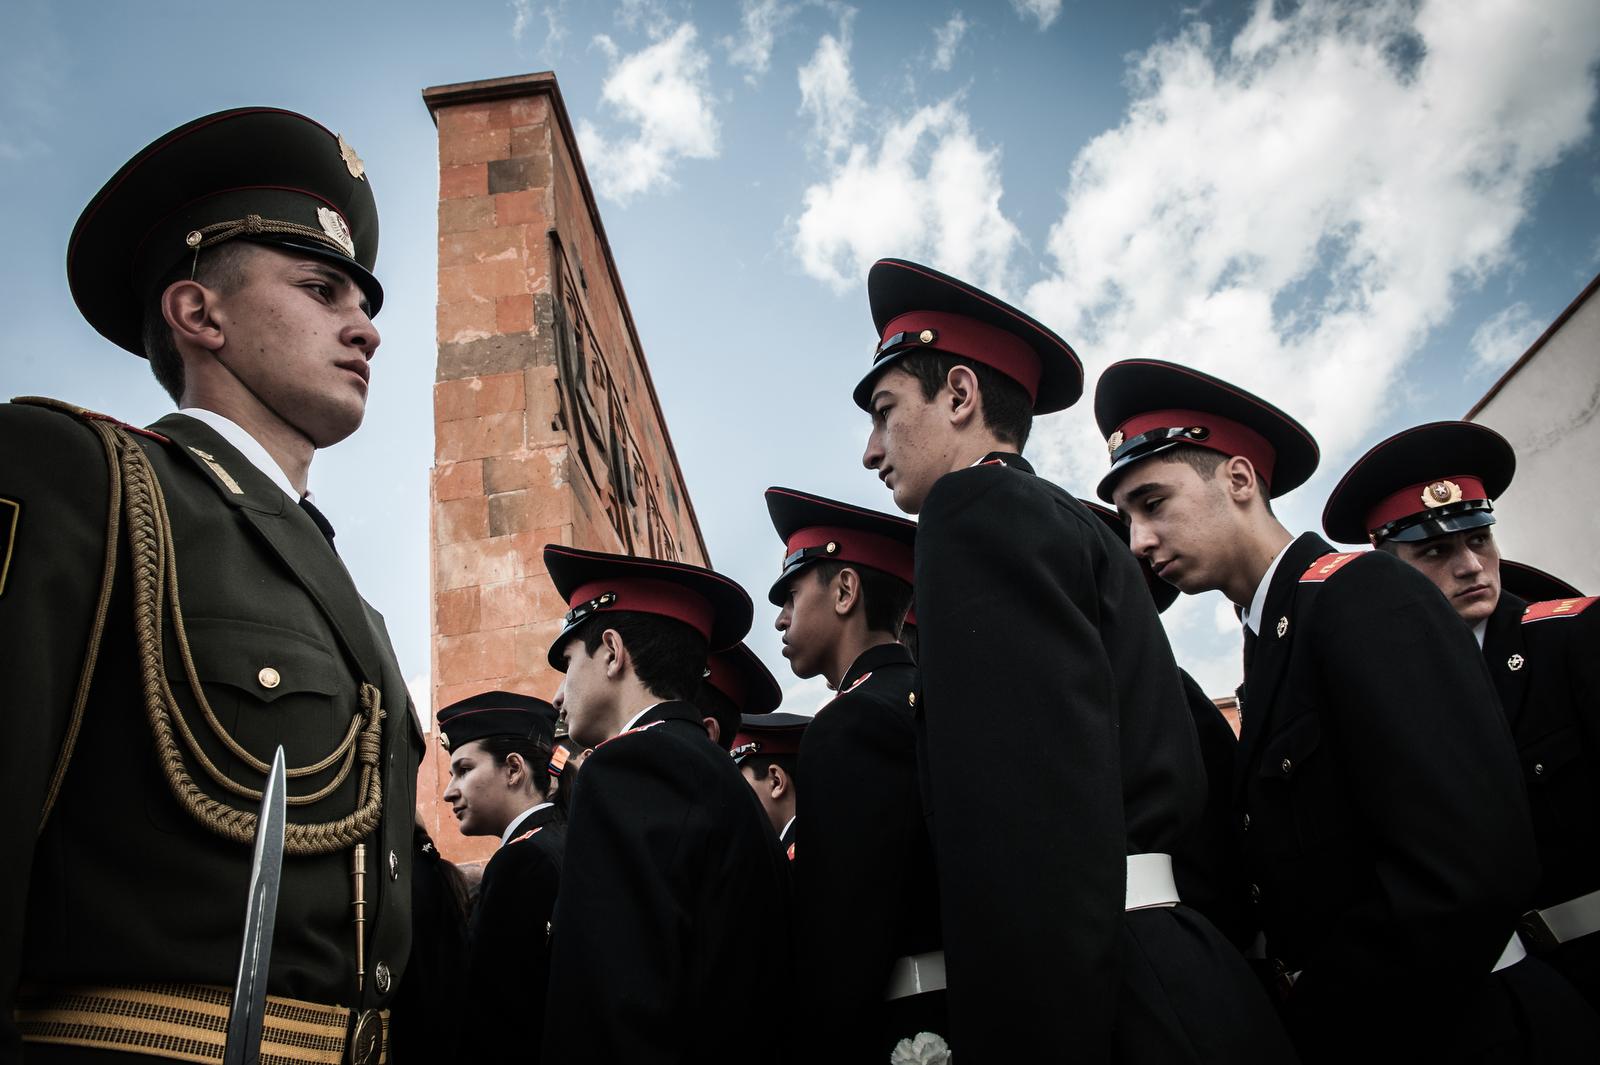 The forgotten war of Nagorno-Karabakh | Mattia Vacca